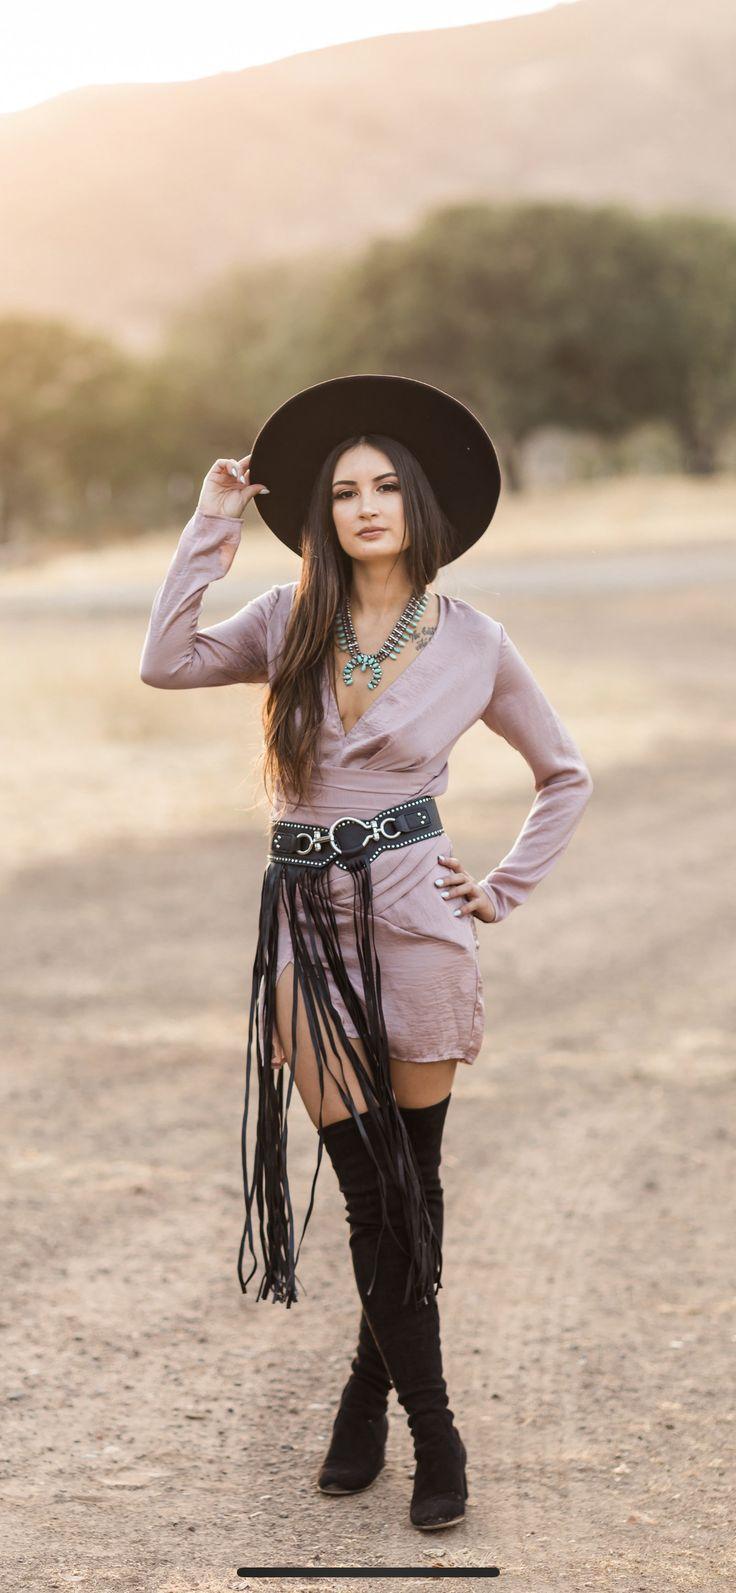 Gabrielle cowgirl, babe leg redhead